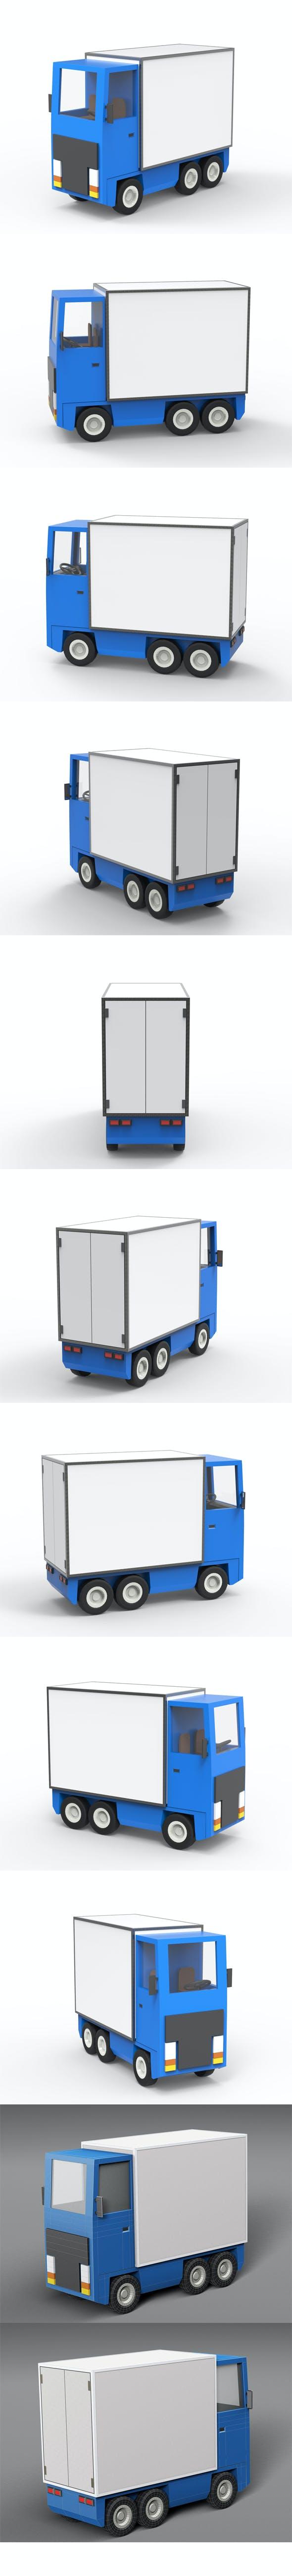 Cartoon freight car 2 - 3DOcean Item for Sale